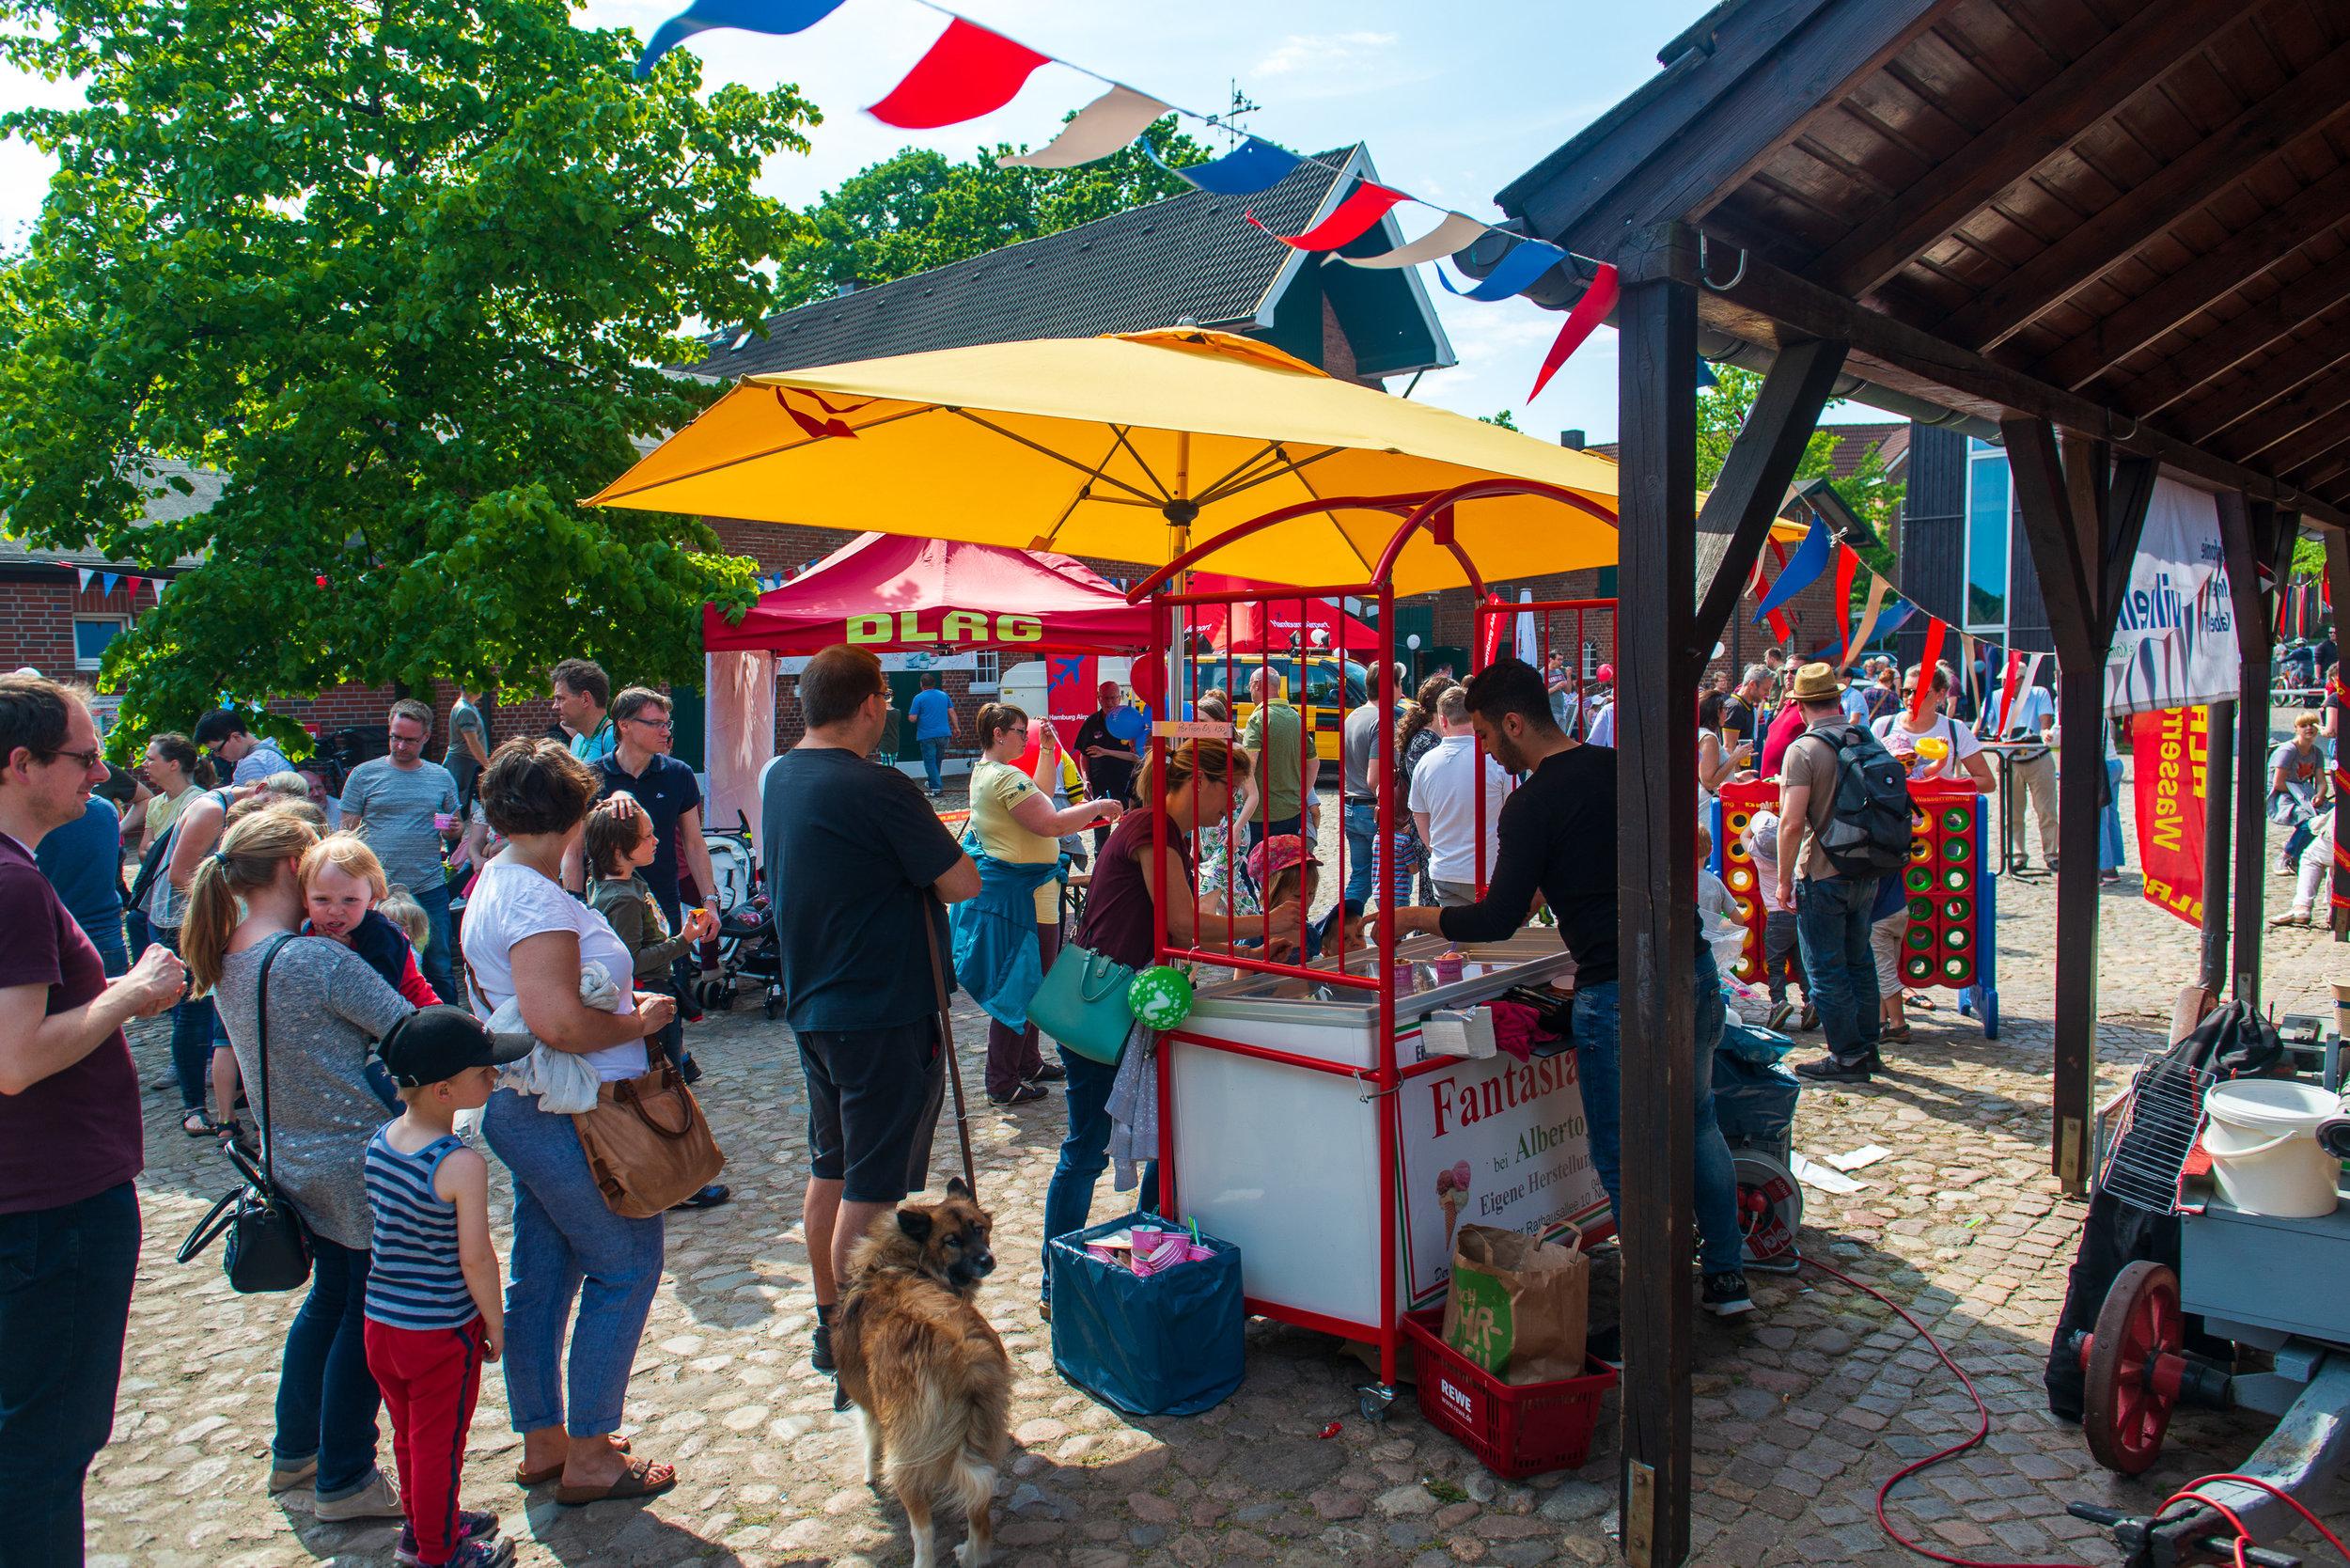 13-Norderstedter-Museumsfest-2019-FWM--XO-Dennys-Mamero-WEB-60.jpg